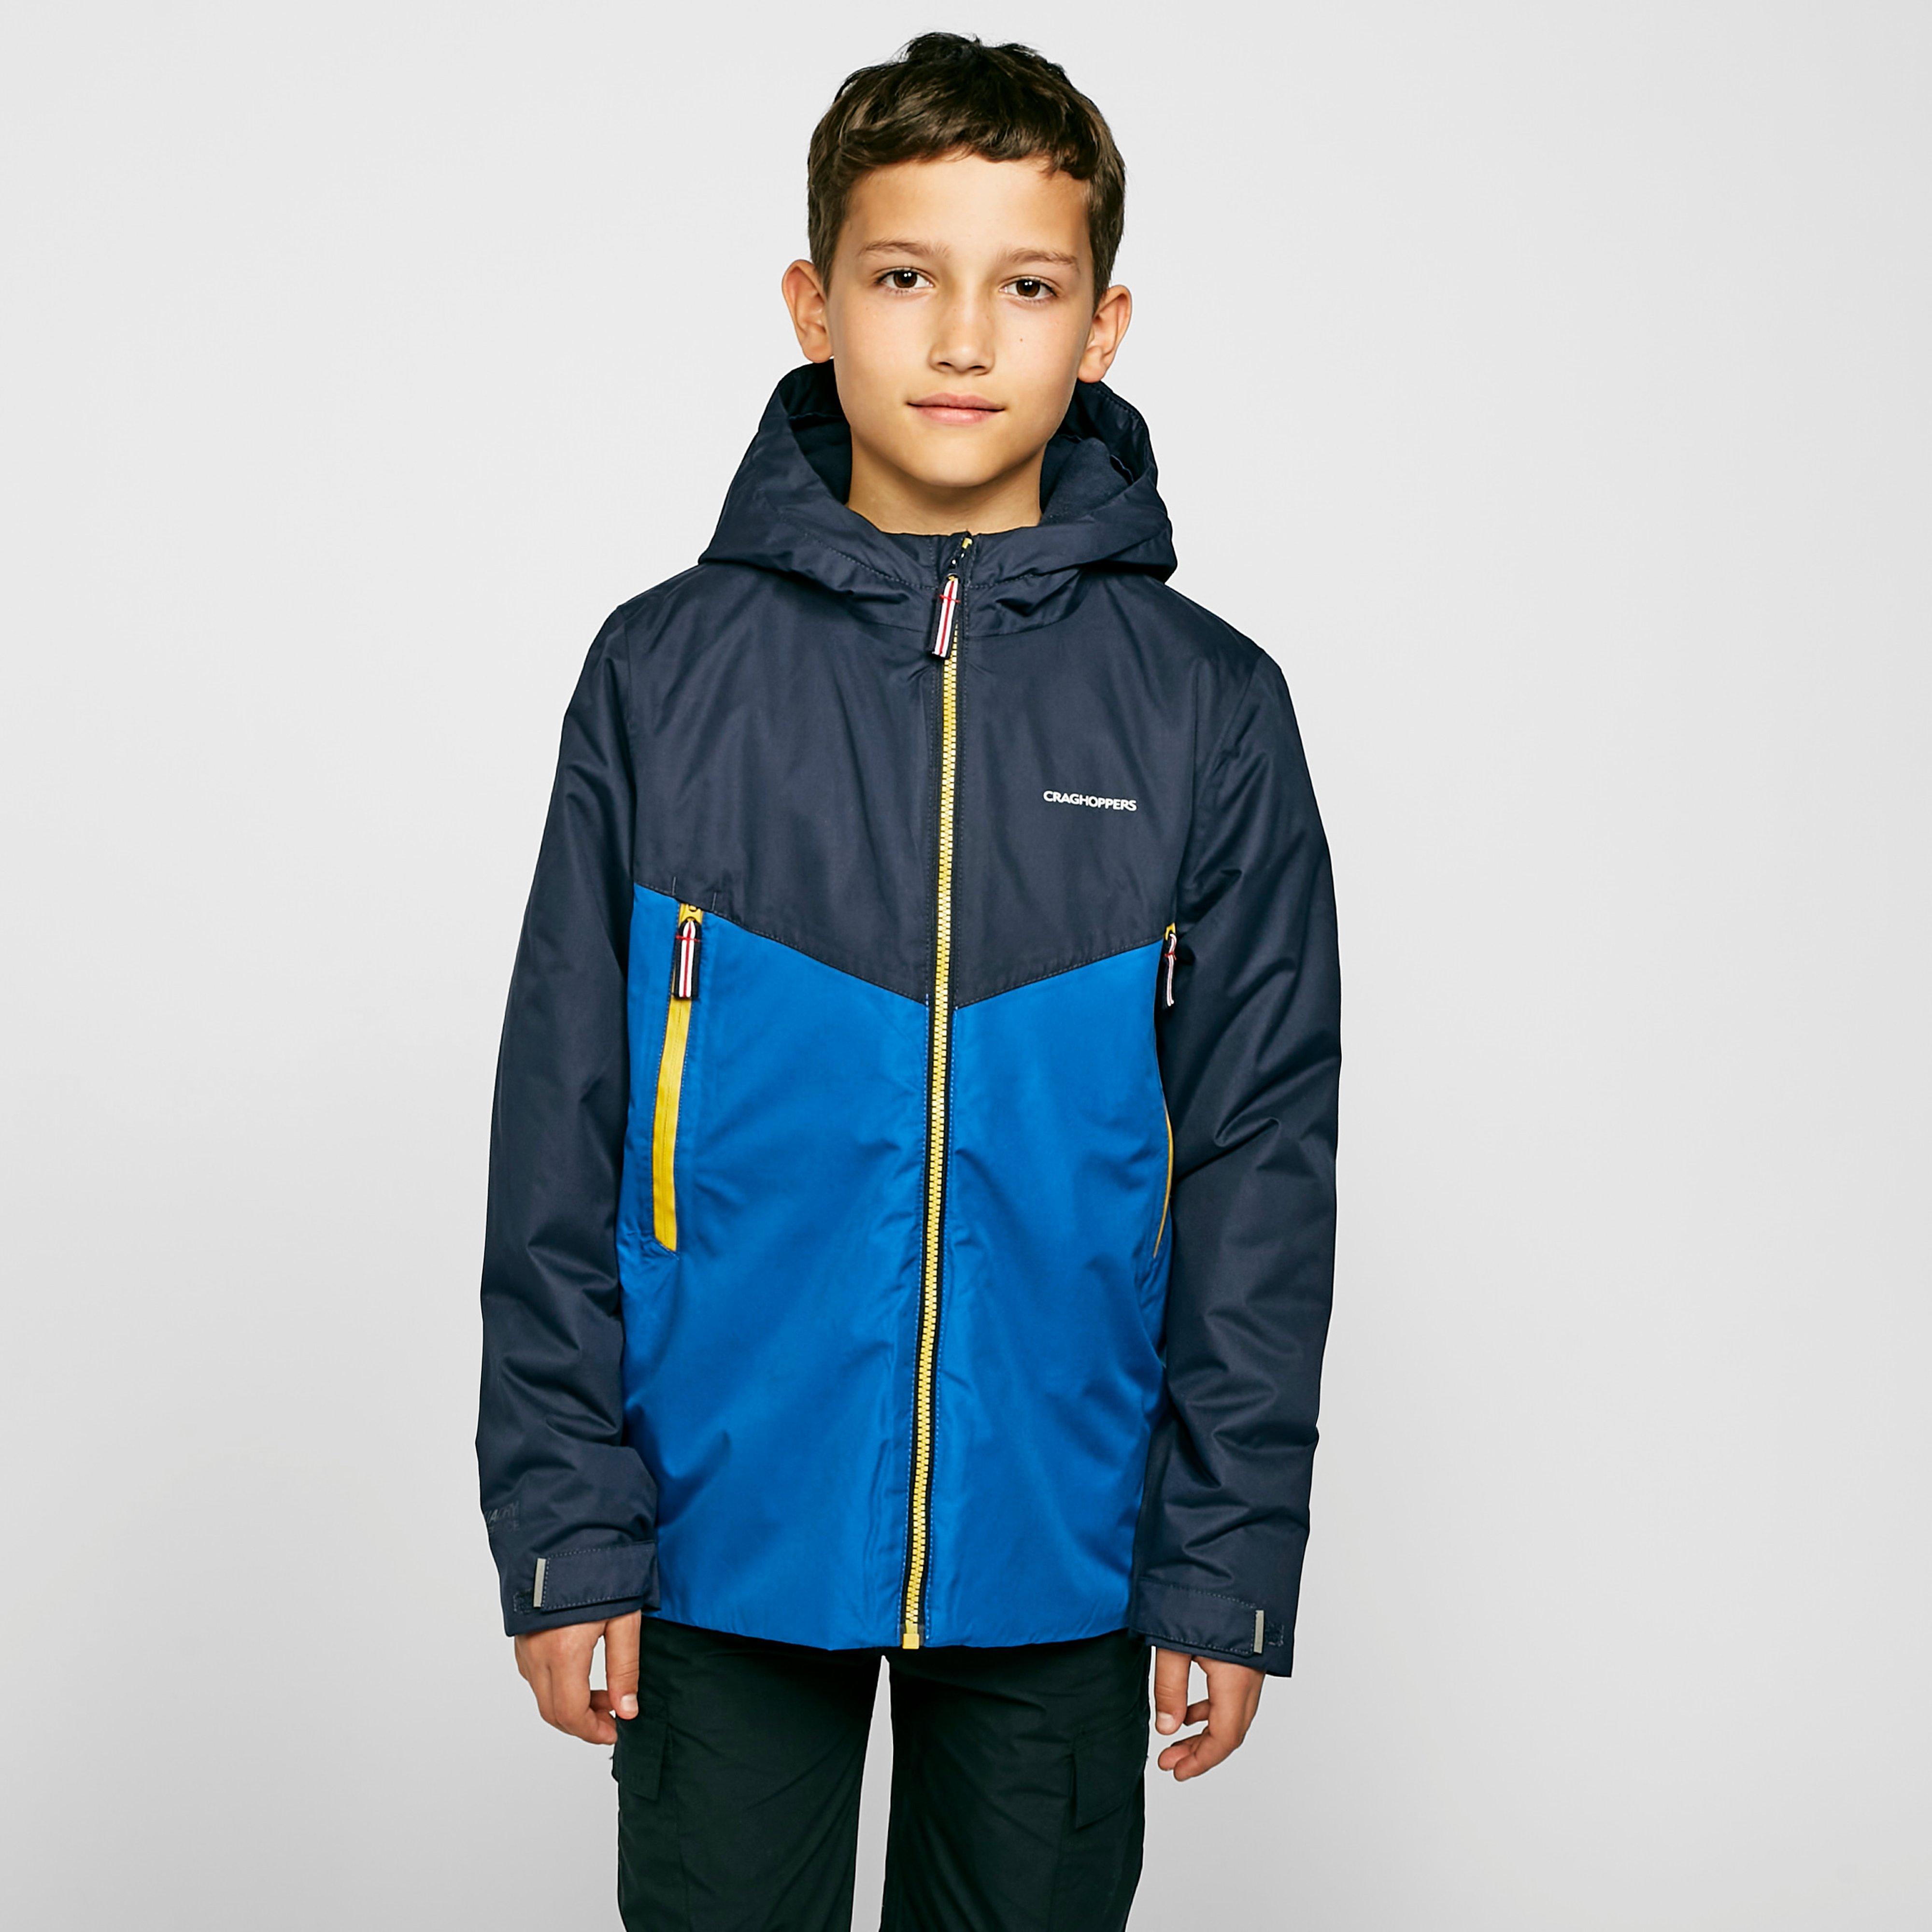 Craghoppers Kids Haider Jacket - Blue/nvy  Blue/nvy